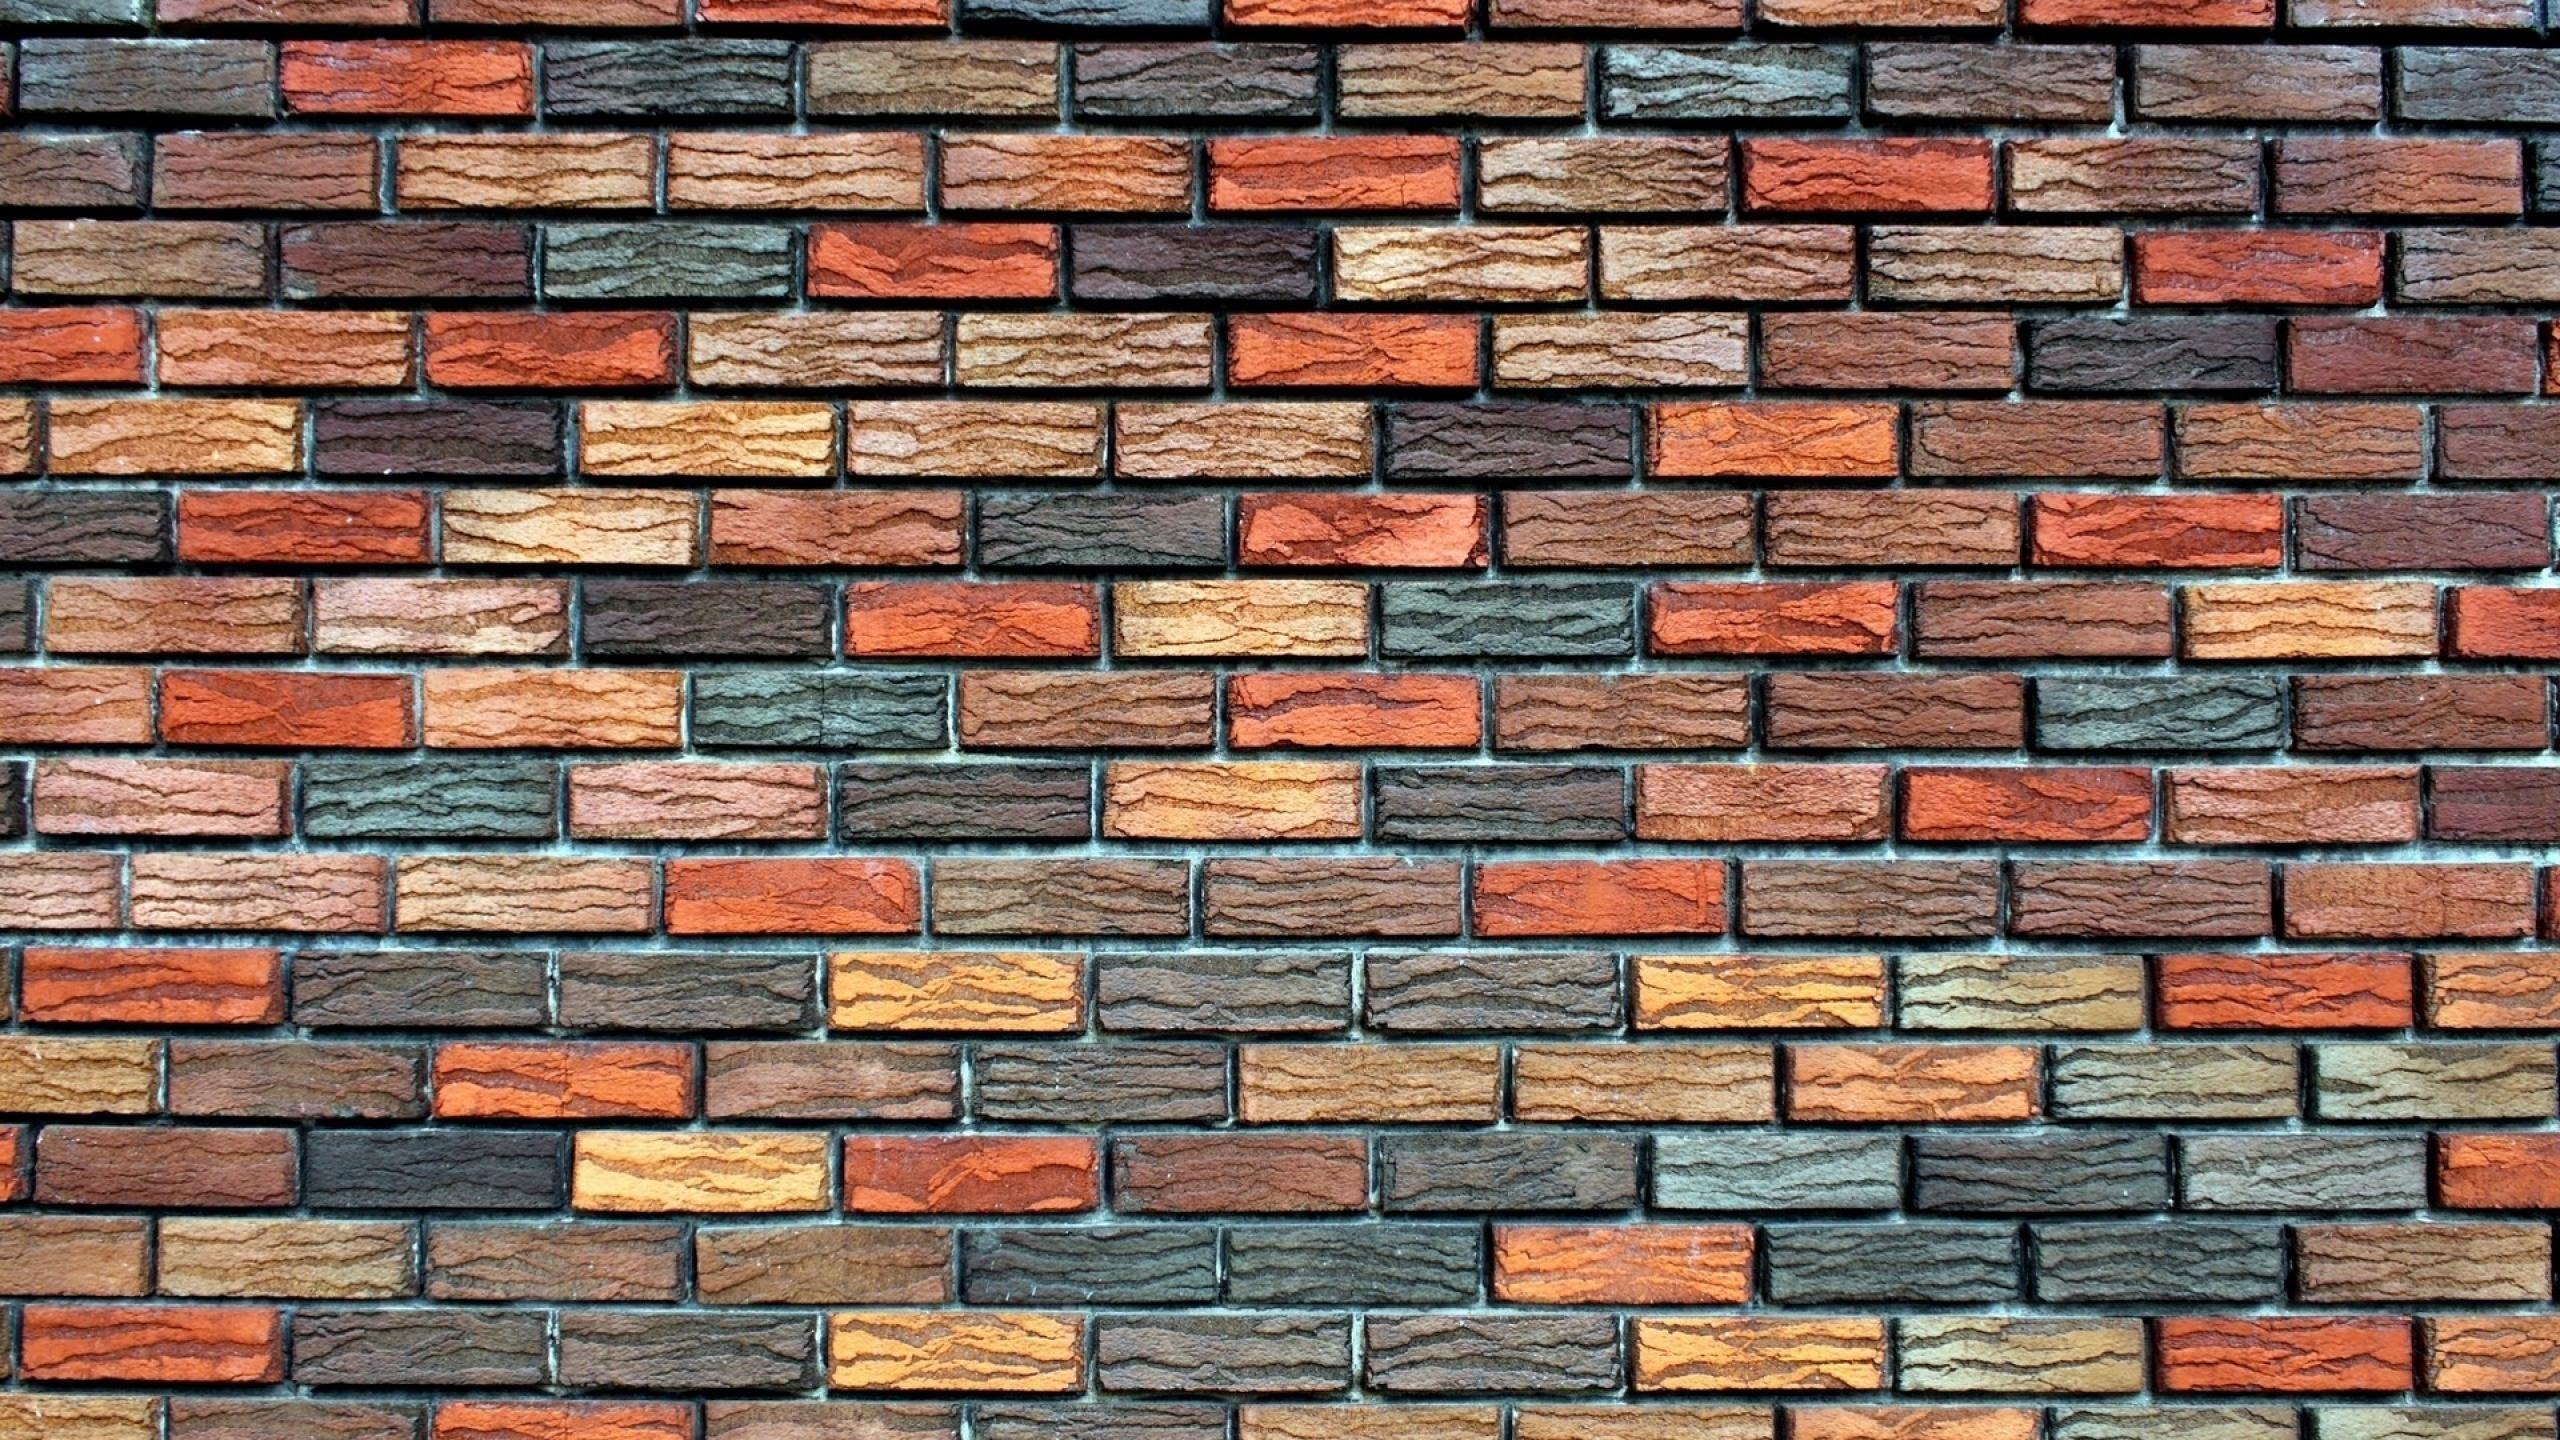 Textured Wall Stone Brick Texture My 787380 Jpg 2560 1440 Dinding Bata Batu Bata Desain